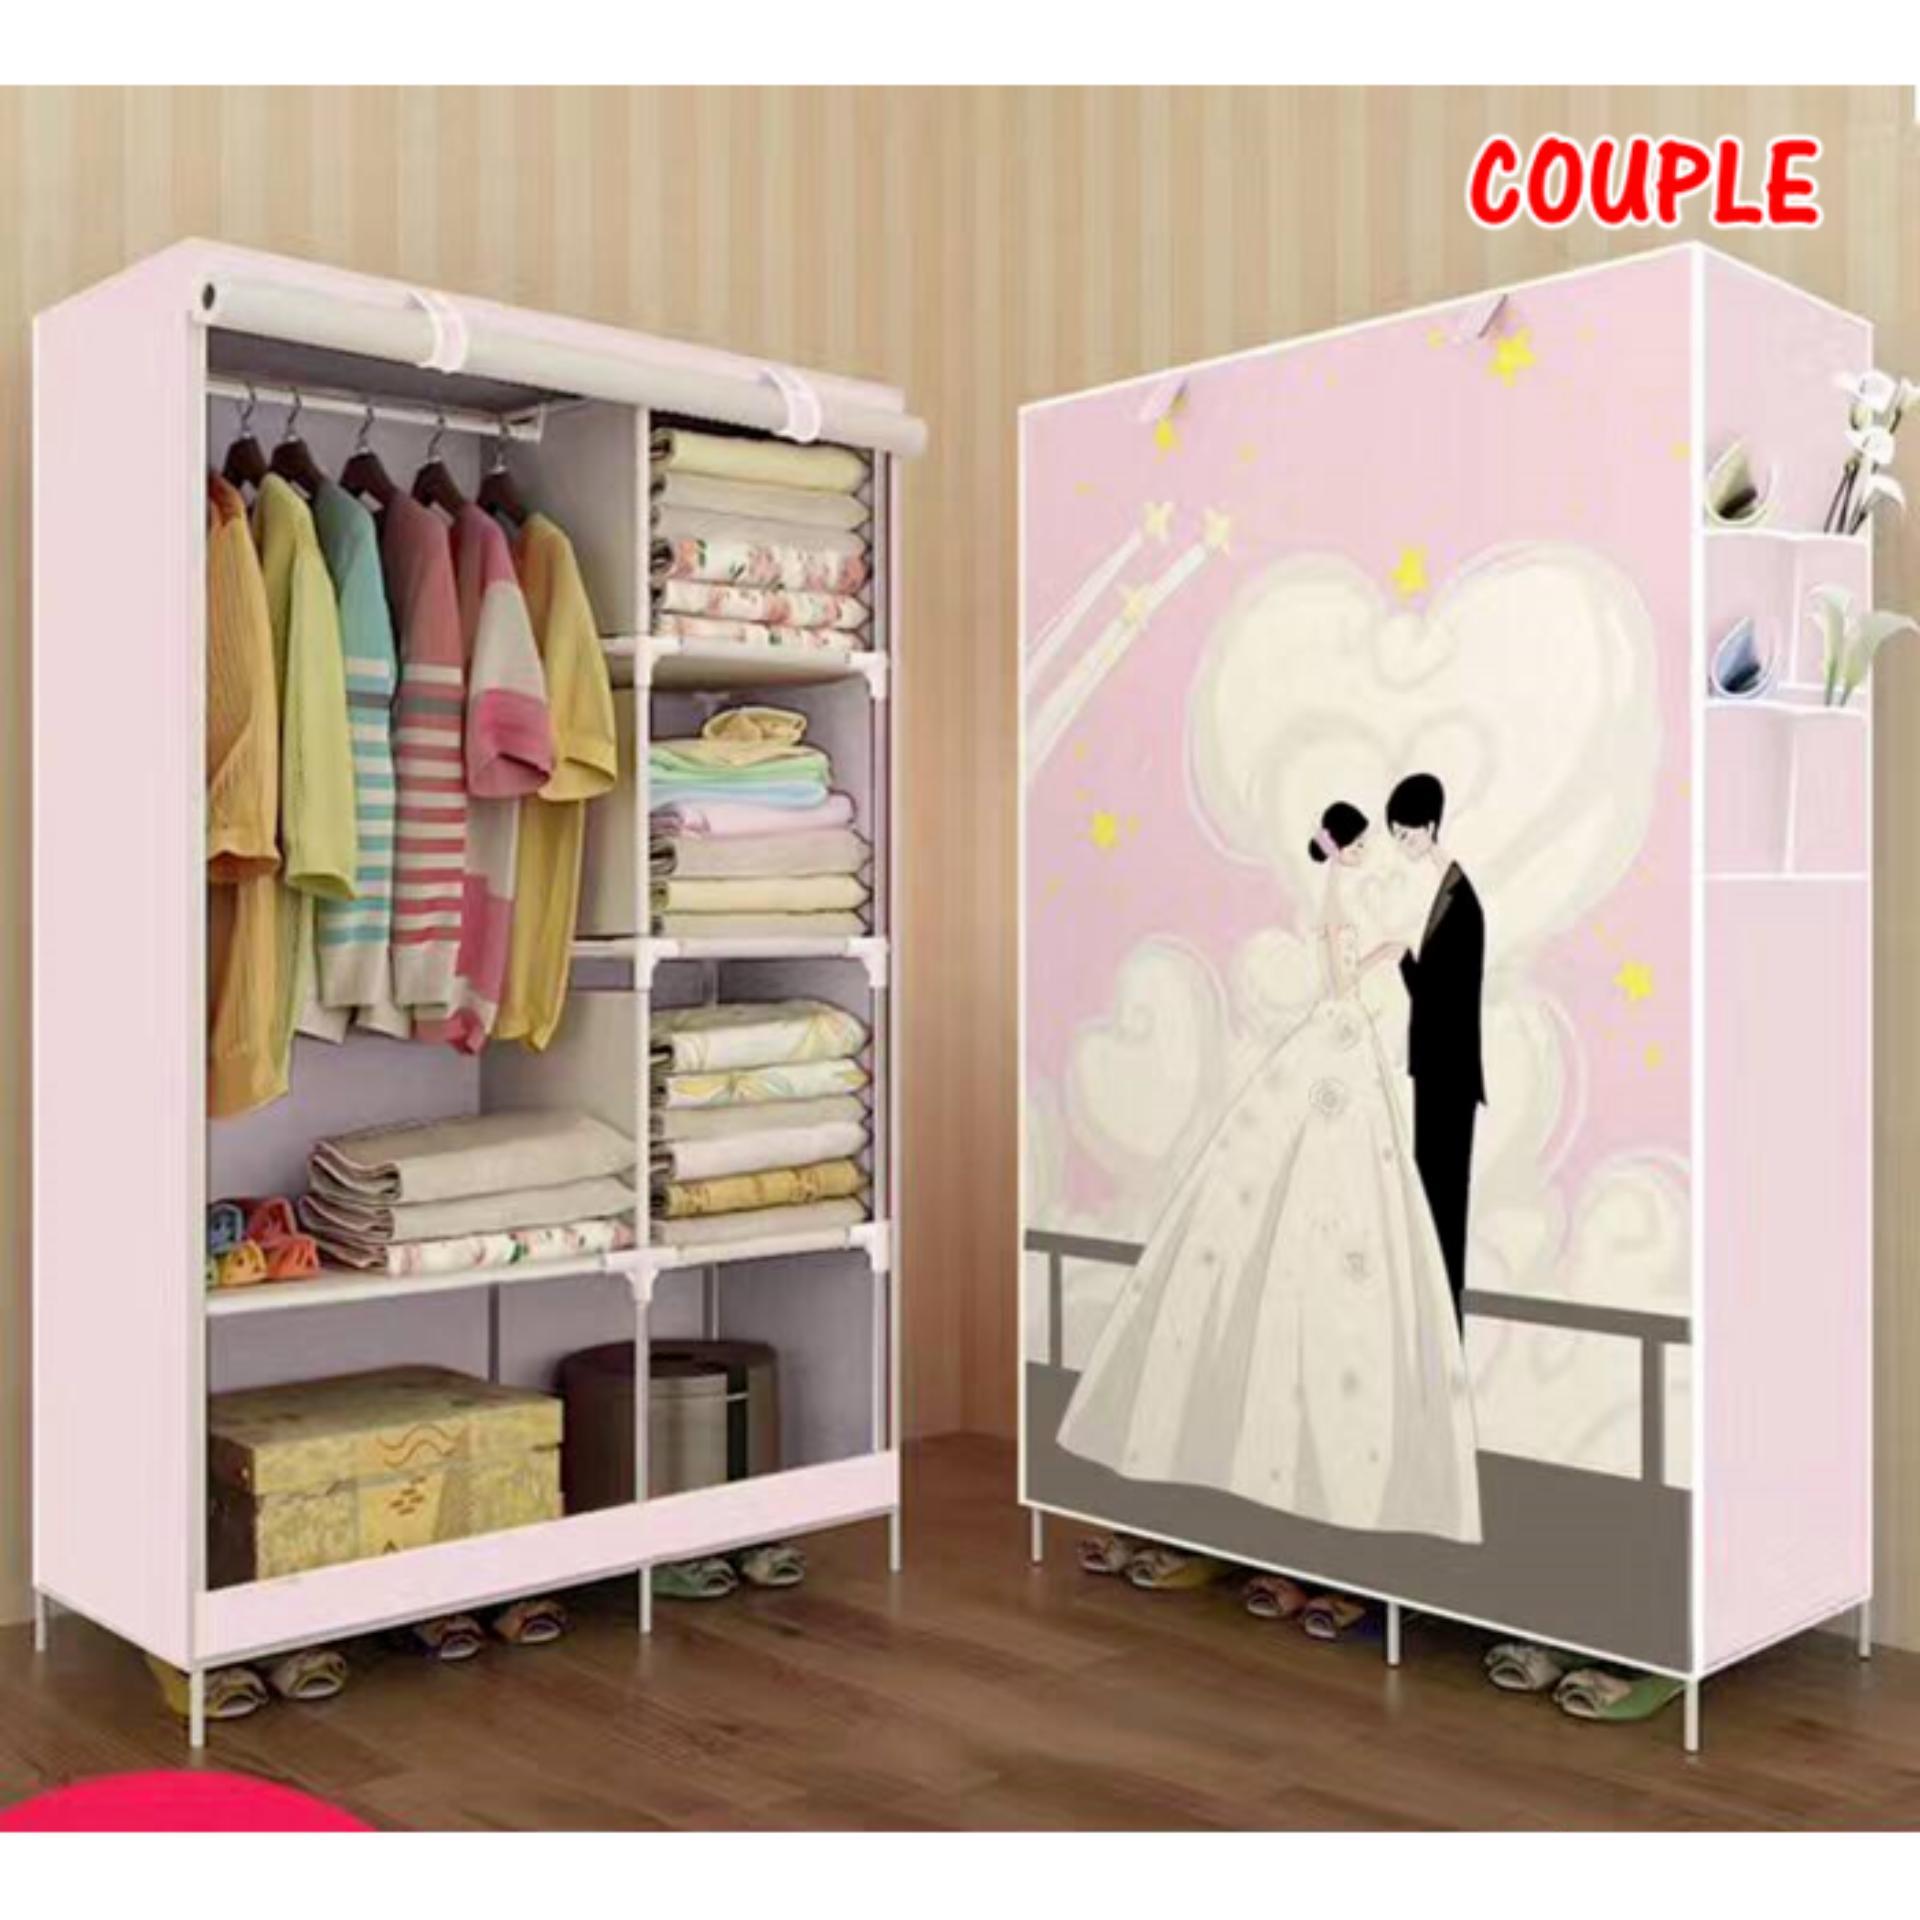 Info Harga Lemari Pakaian Singel Multifunction Wordrobe Rak Baju Super Jumbo Wardrobe Nf 2 Couple Serbaguna